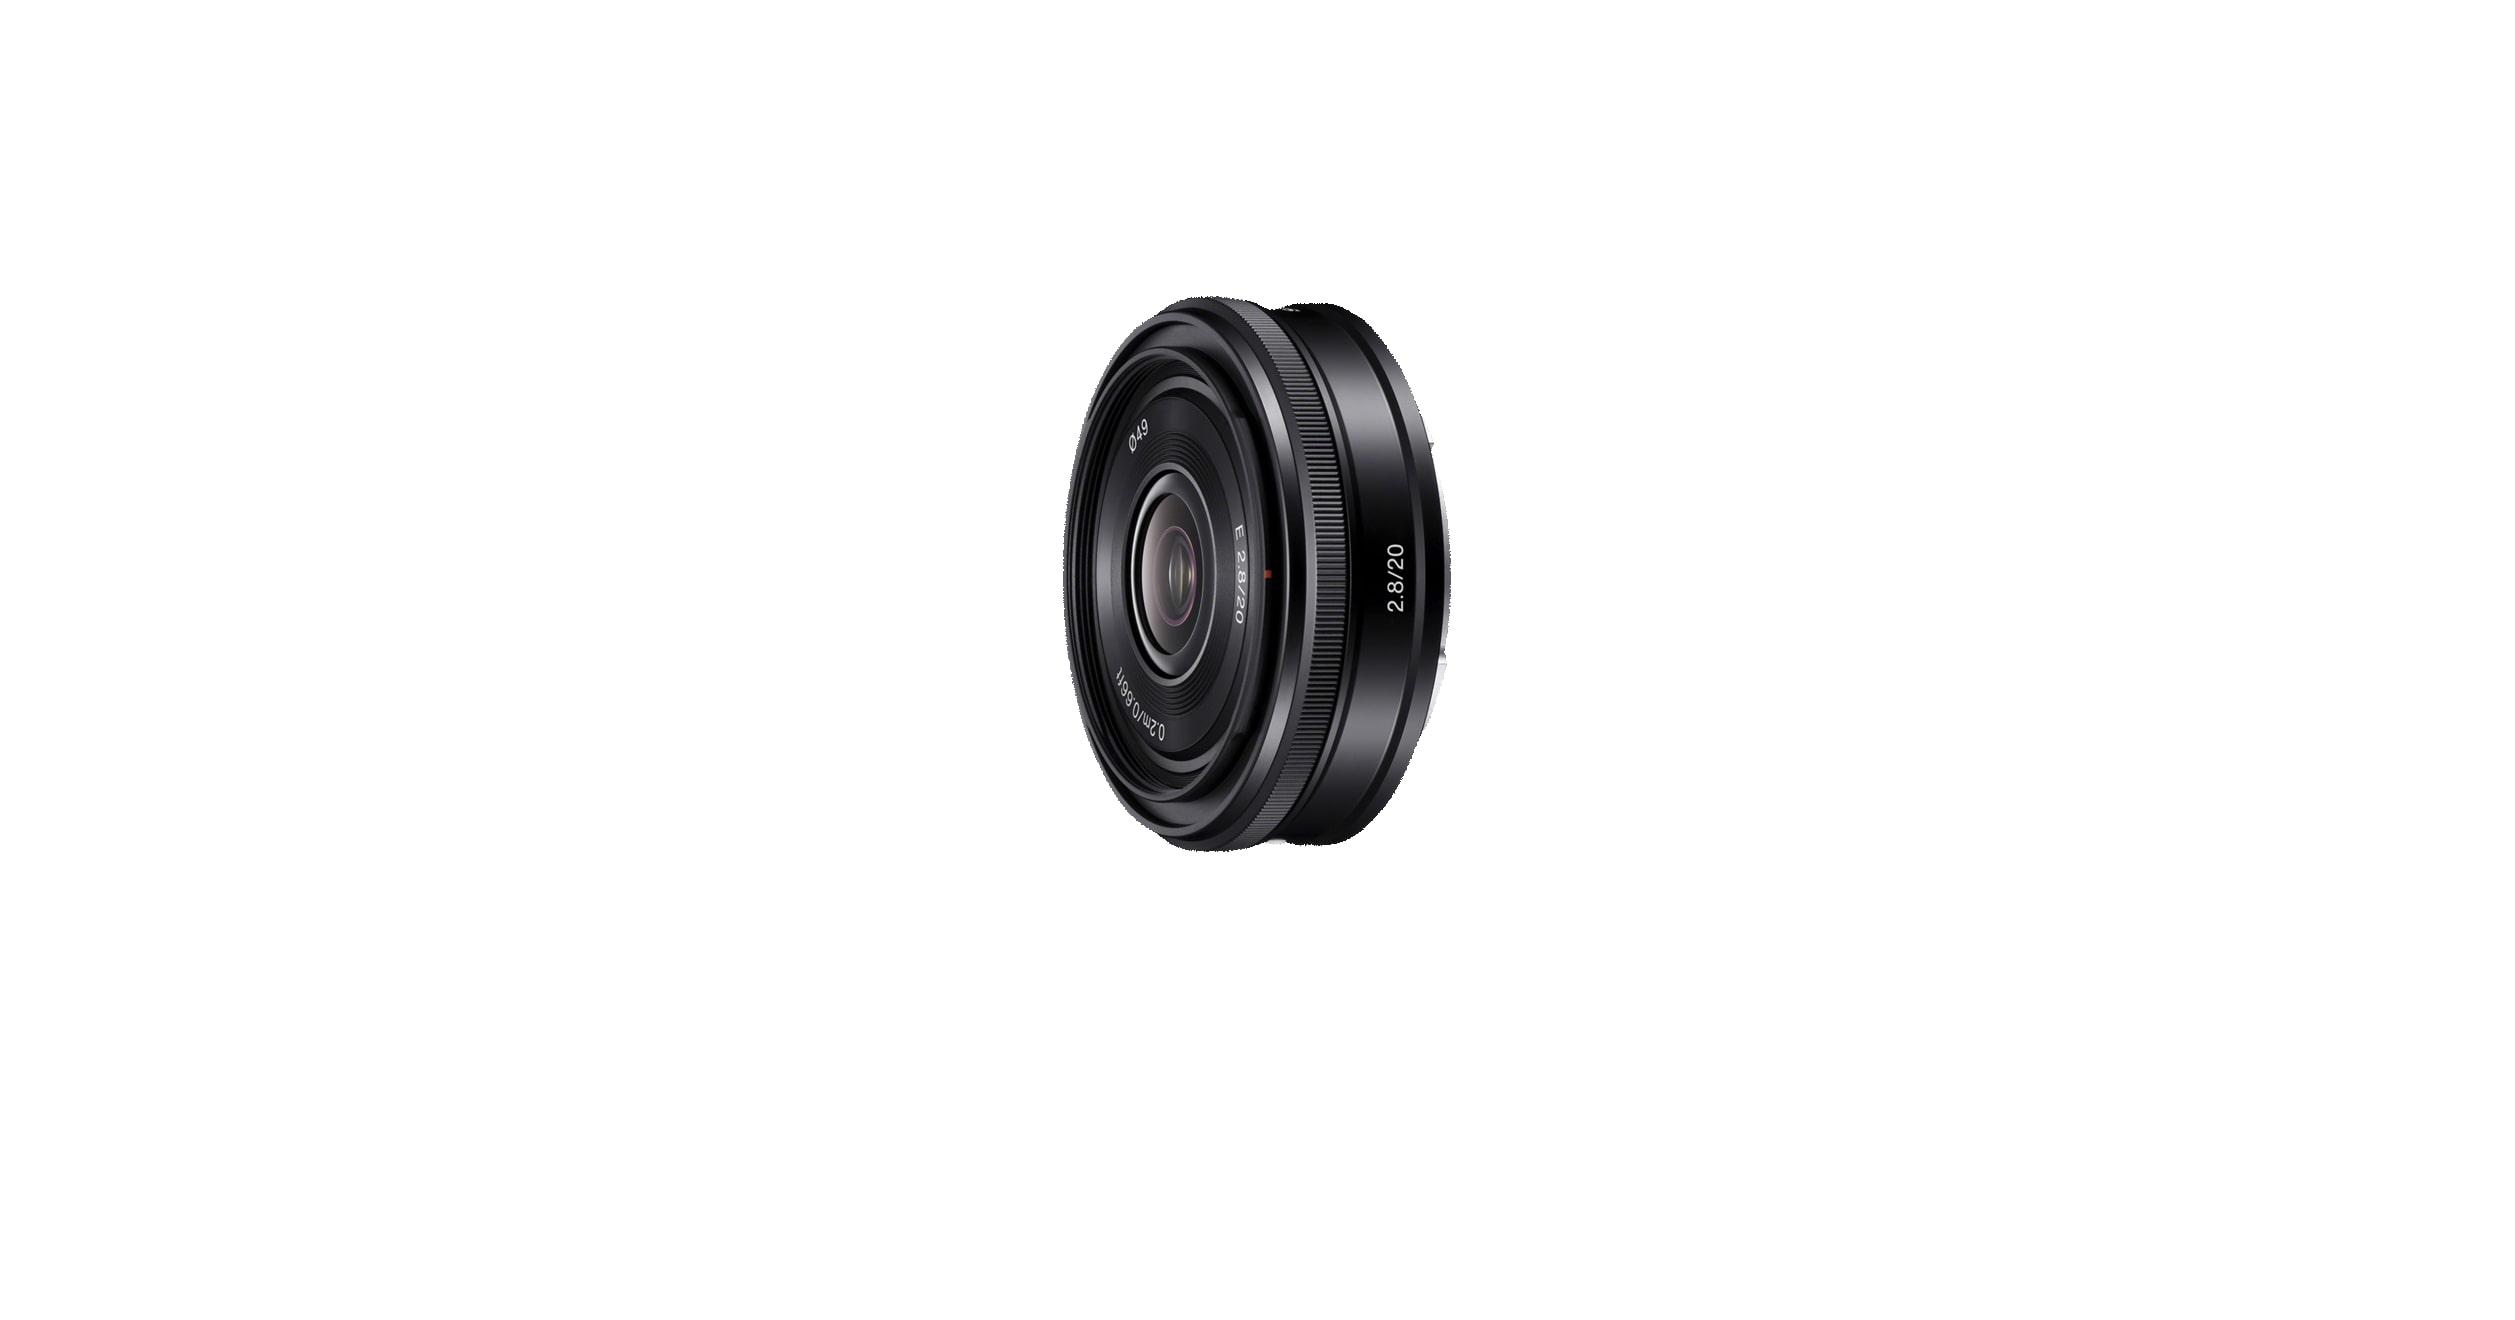 Lente cámara | Gran angular lente 20mm | SEL20F28 | Sony CO